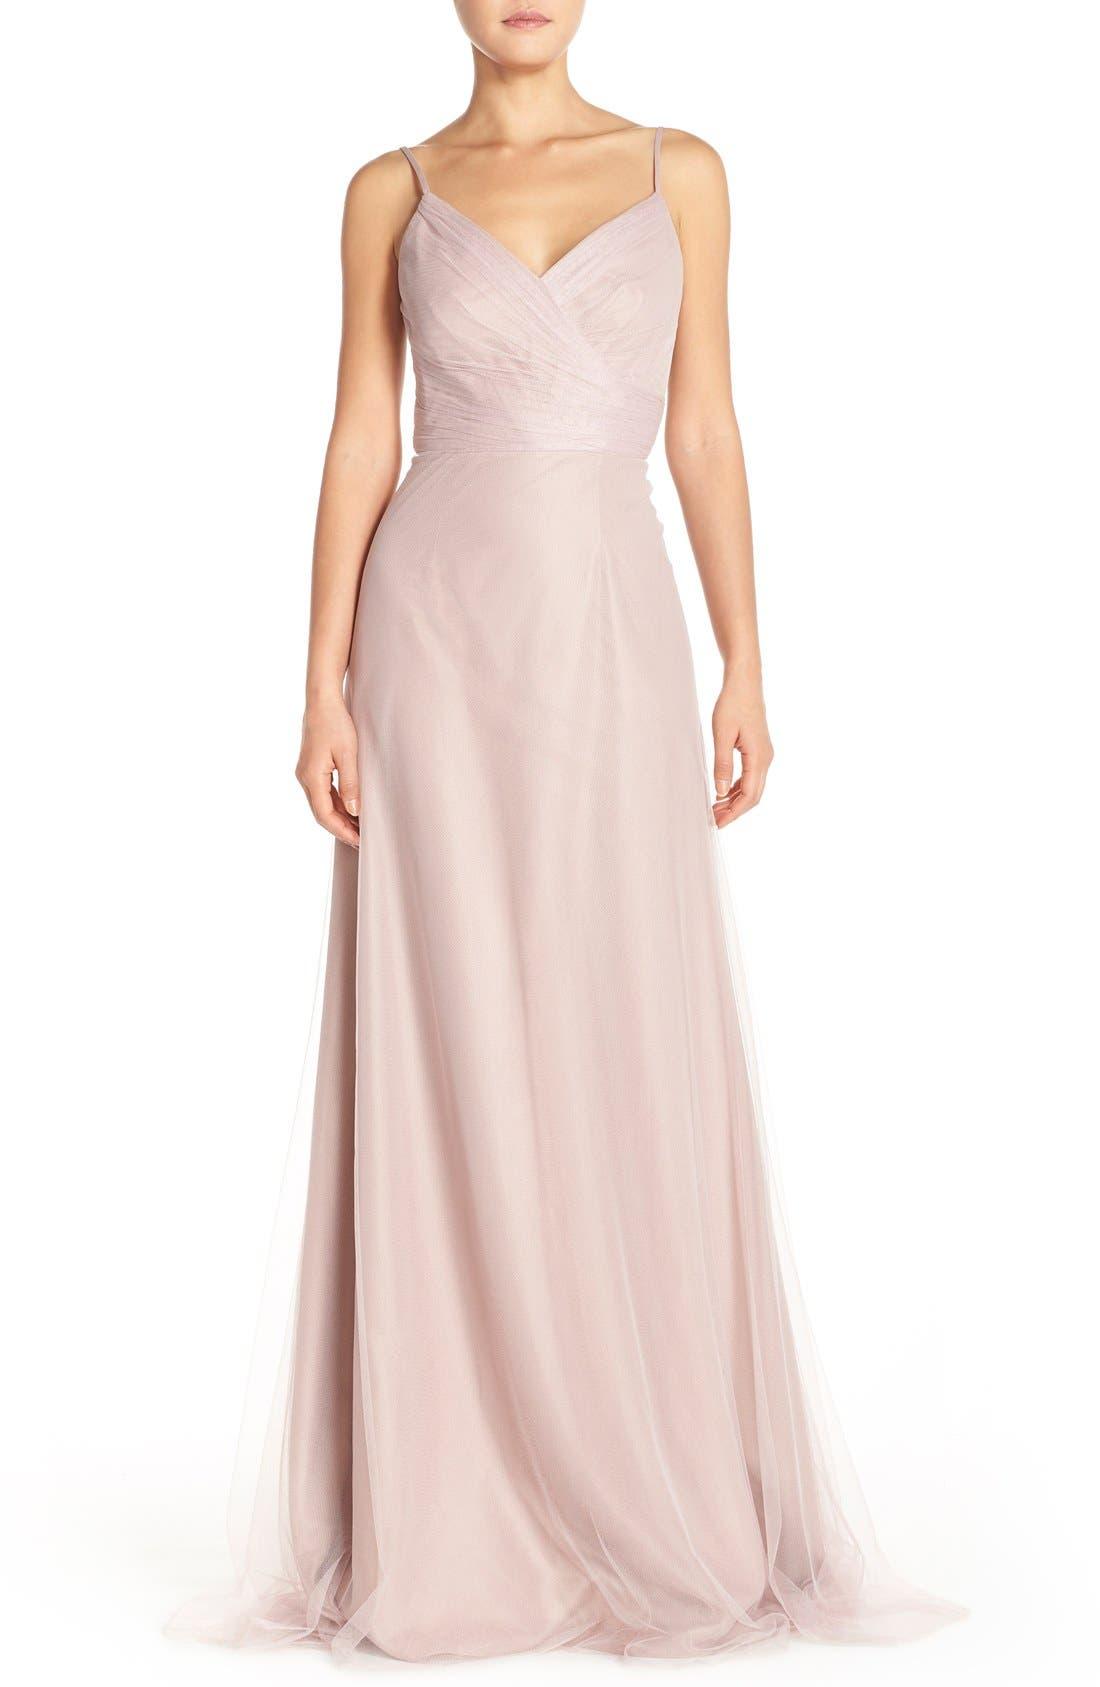 Alternate Image 1 Selected - Monique Lhuillier Bridesmaids Surplice Tulle Gown